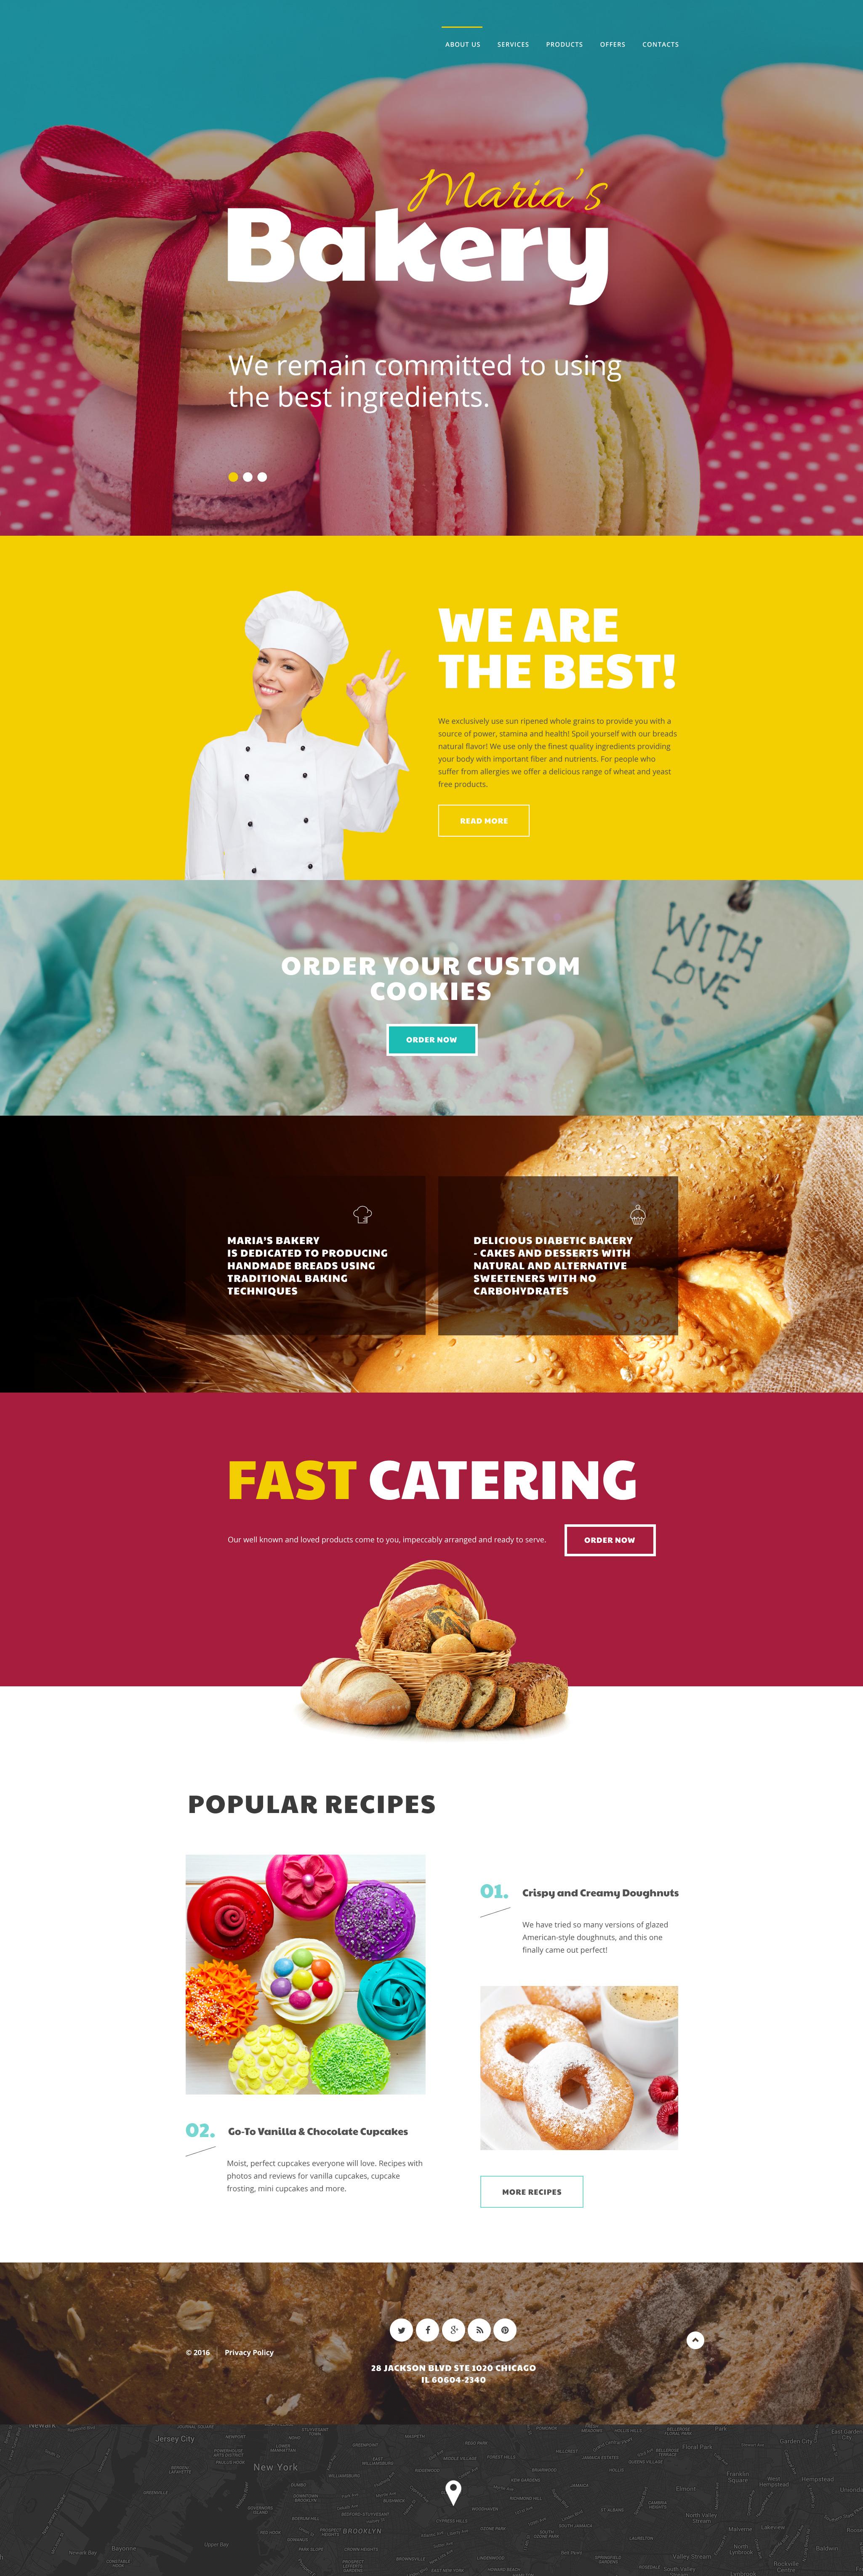 """Maria's Bakery"" 响应式网页模板 #58701 - 截图"